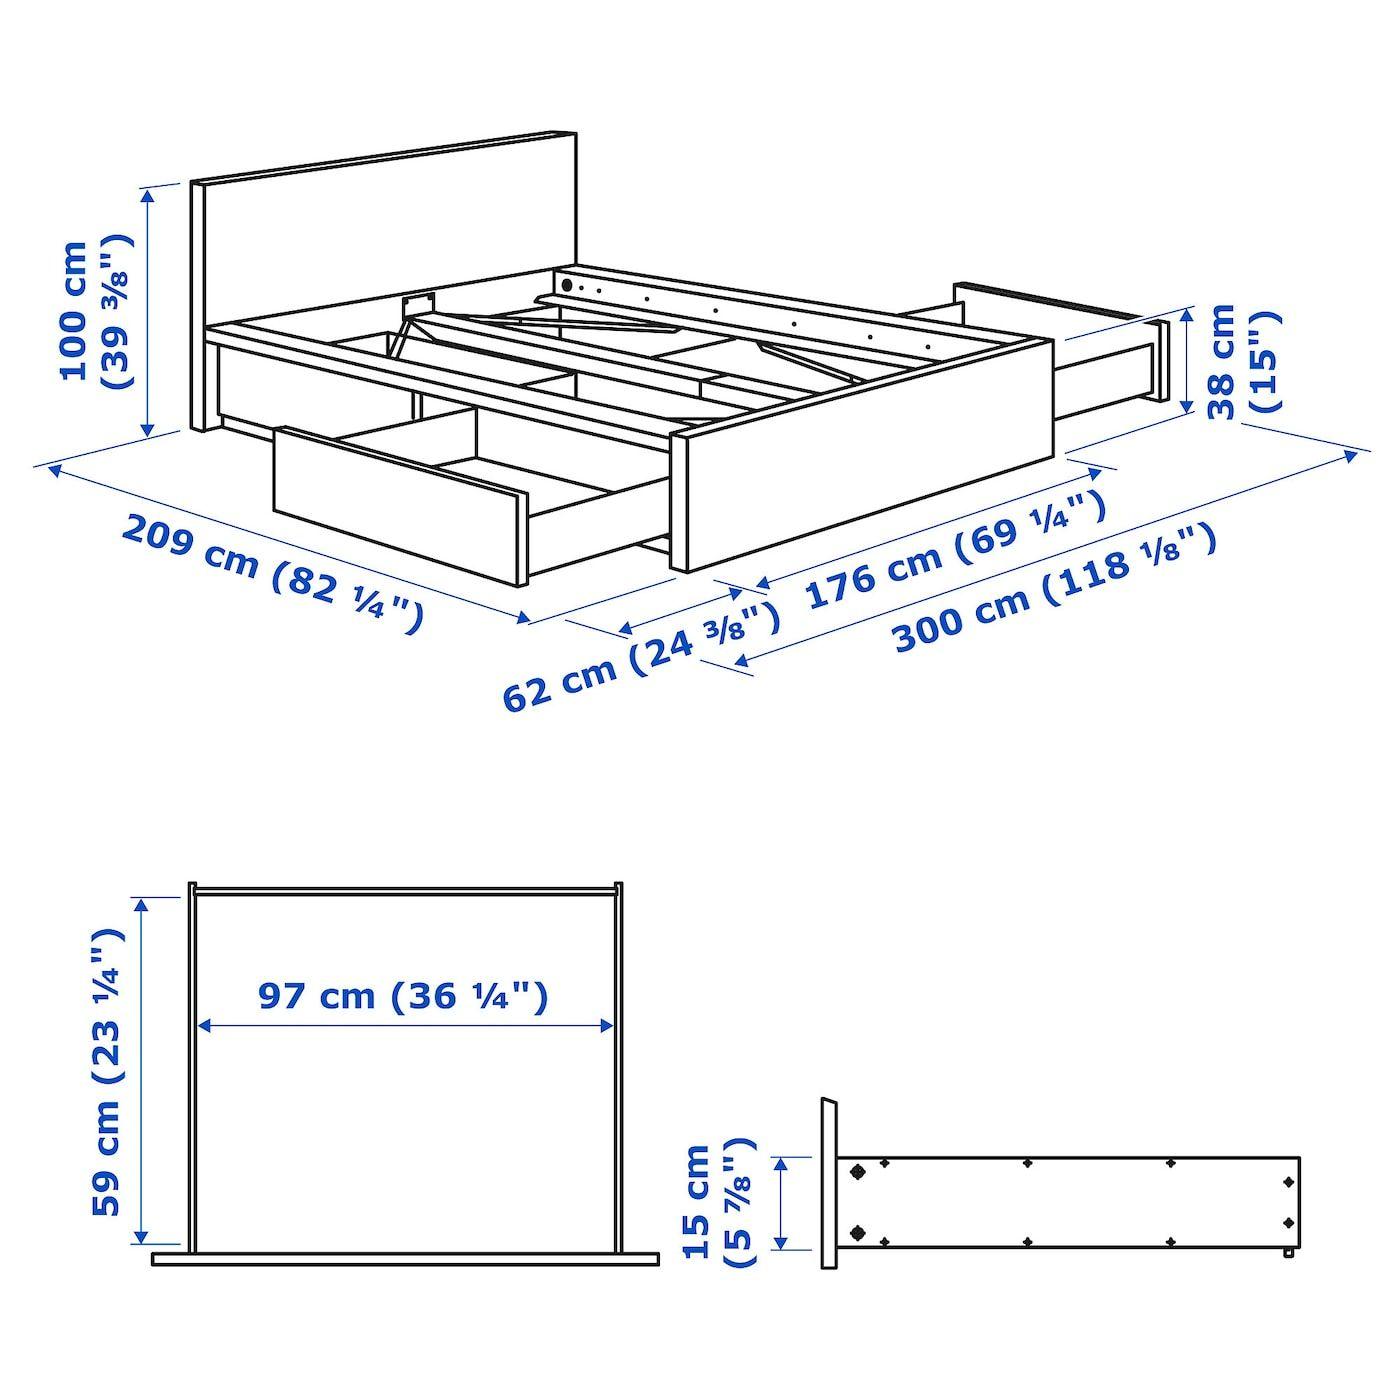 Malm Bedframe Hoog Met 4 Bedlades Wit Gelazuurd Eikenfineer 160x200 Cm Ikea Malm Bett Bettgestell Aufbewahrungsbox